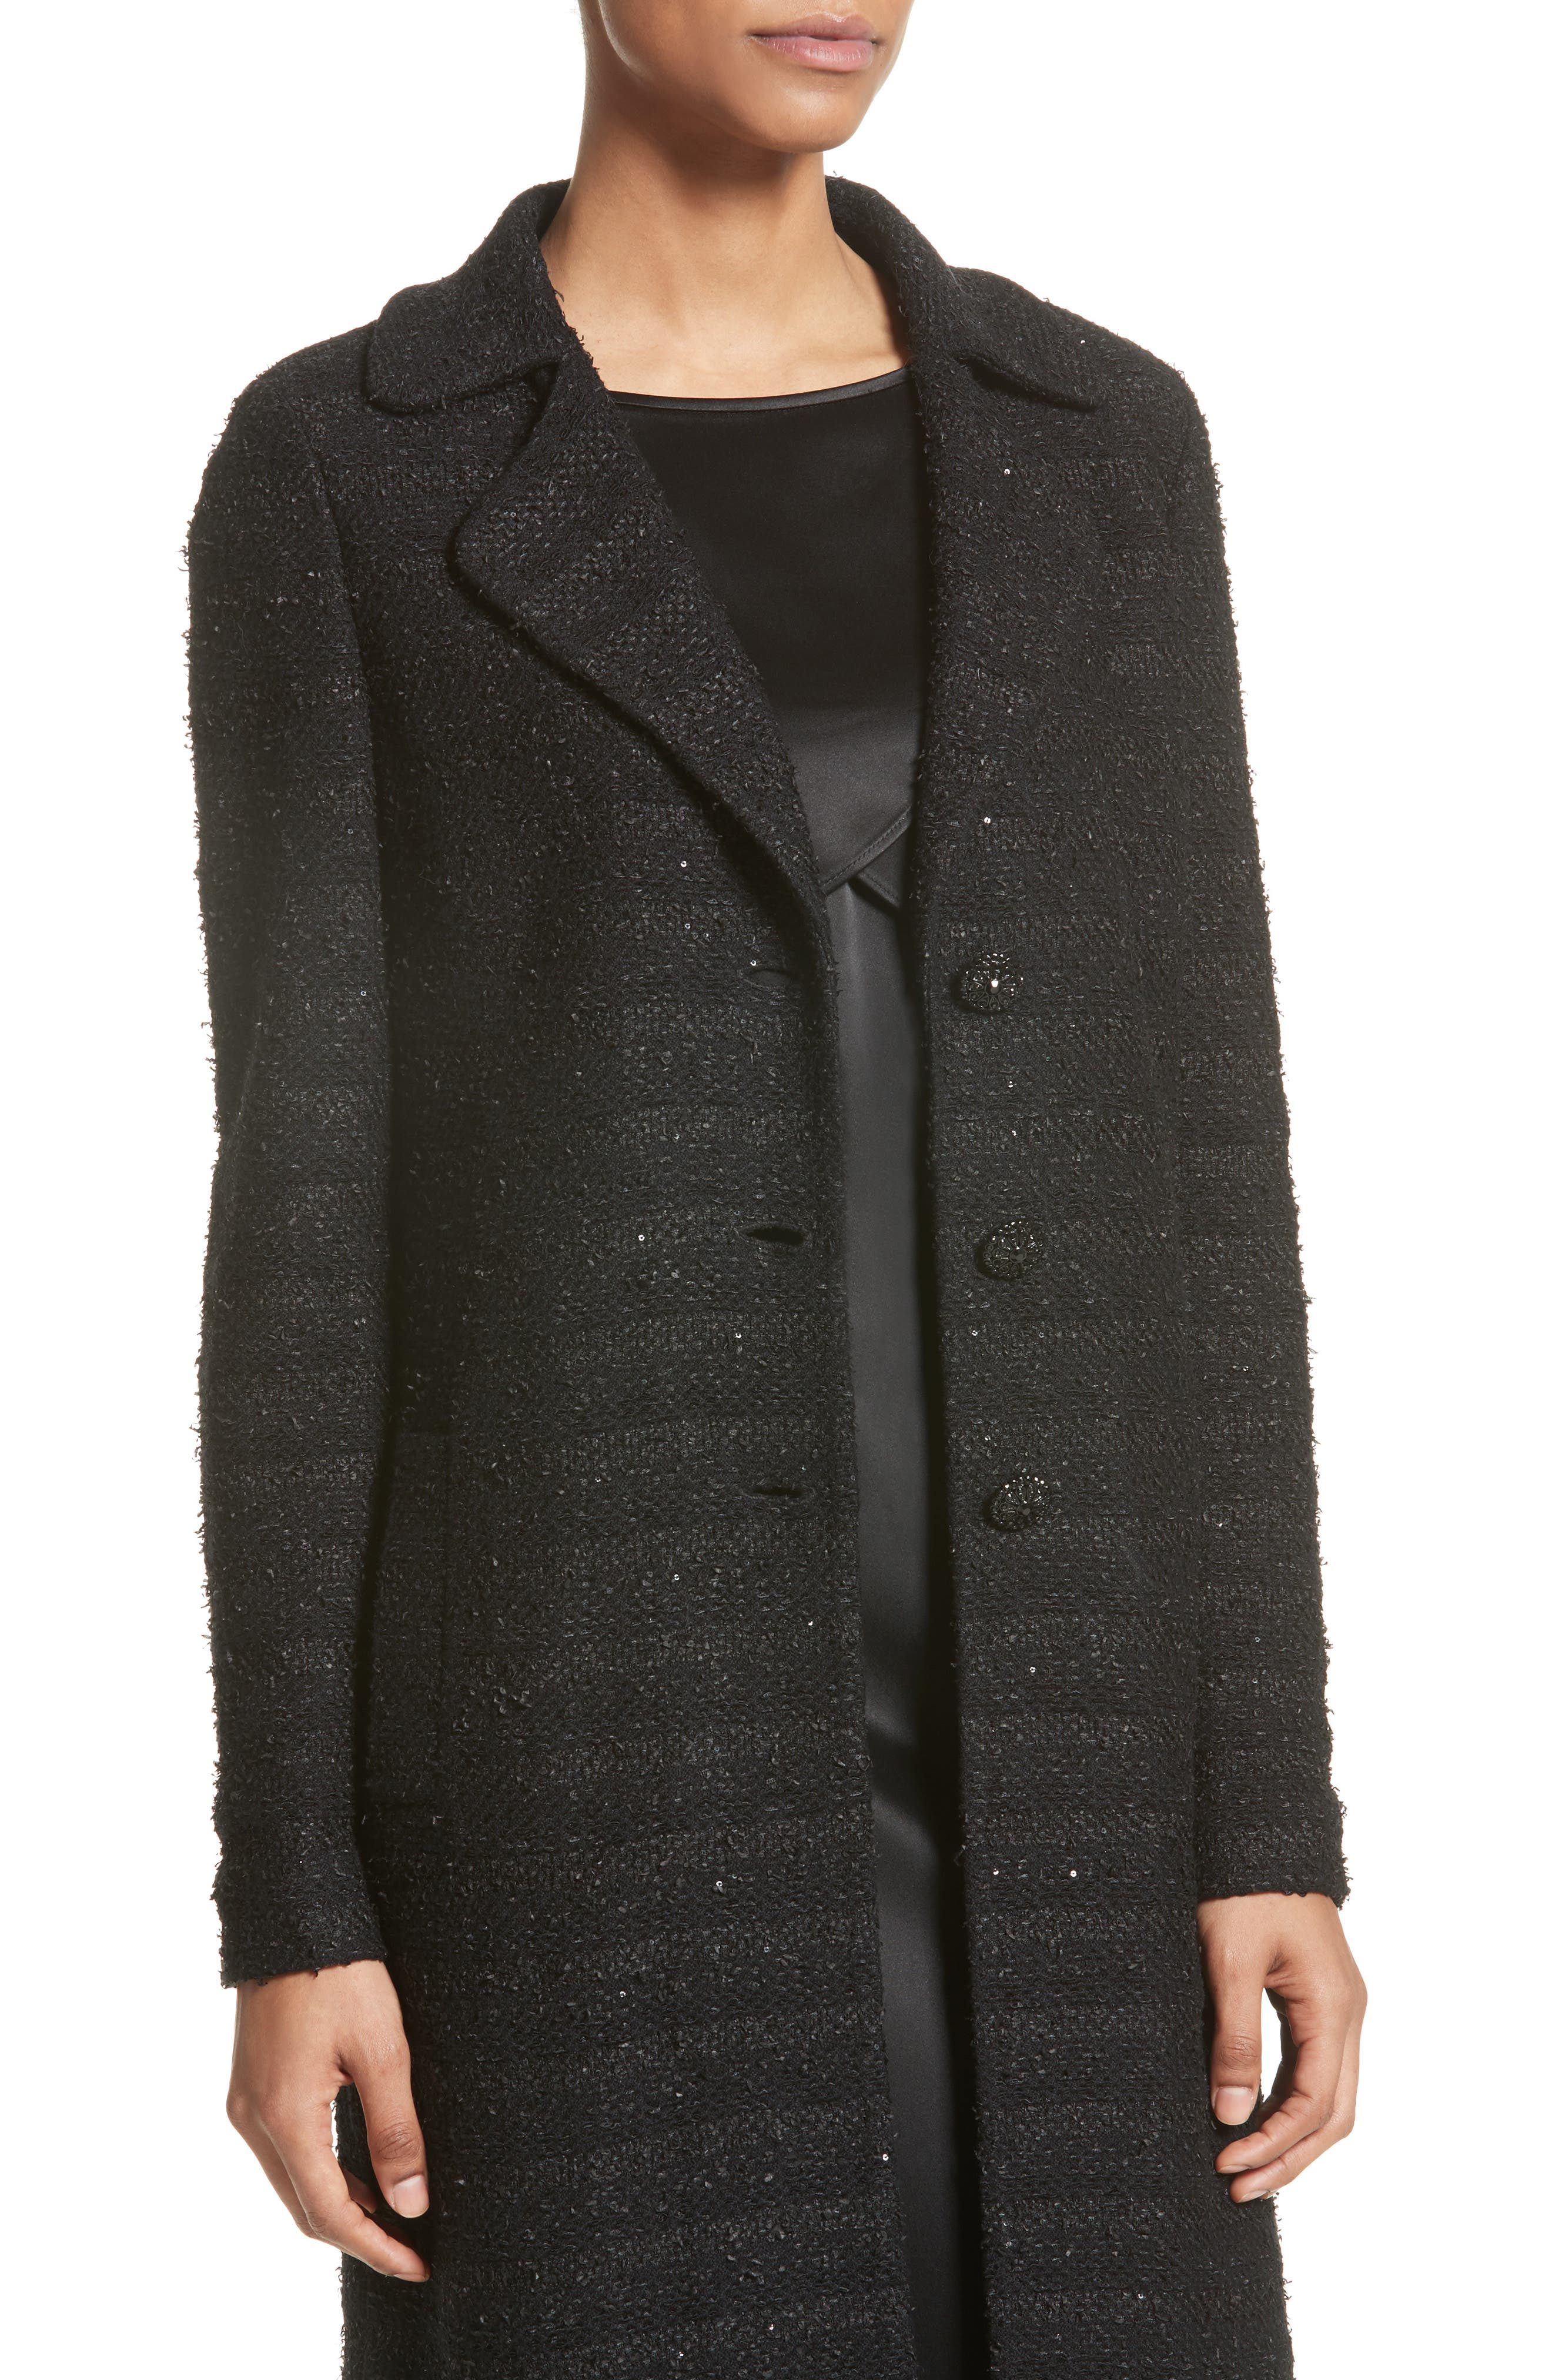 Sequin Knit Topper with Detachable Genuine Rabbit Fur Collar,                             Alternate thumbnail 2, color,                             001